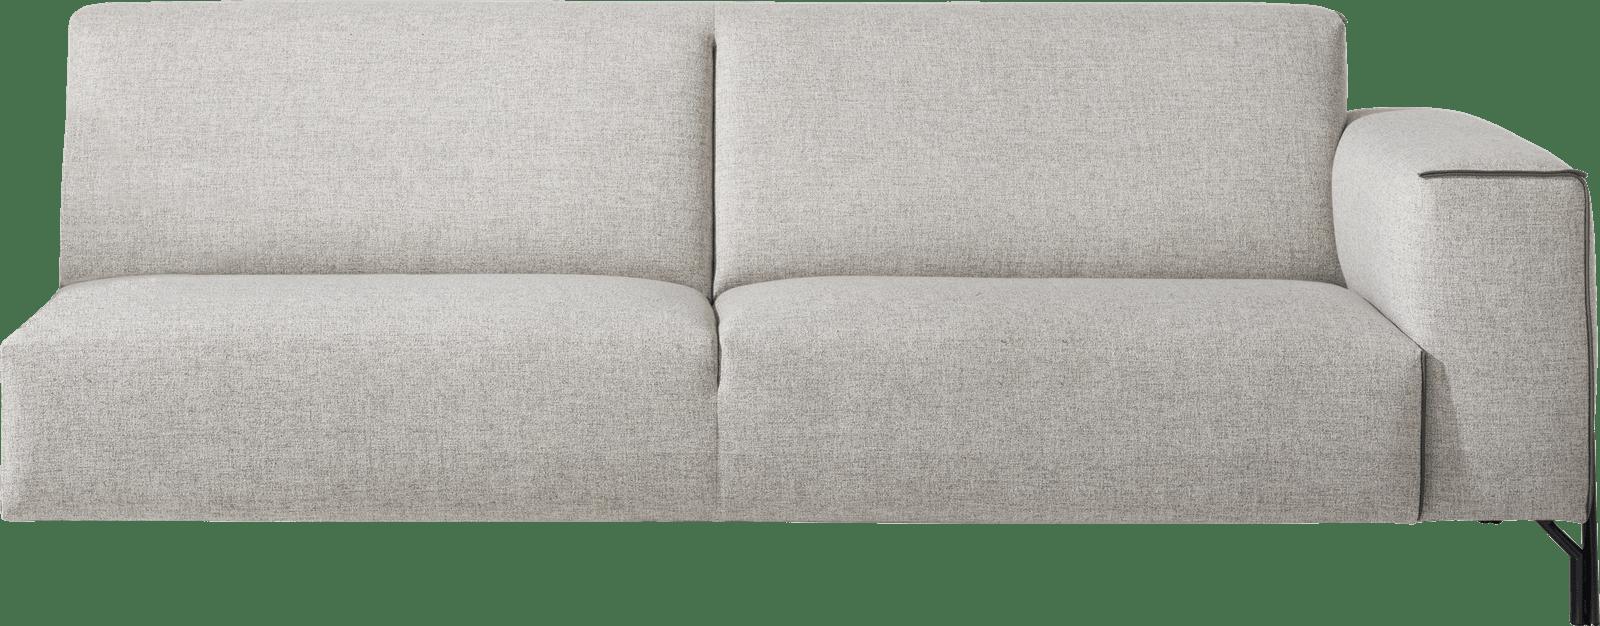 XOOON - Prizzi - Design minimaliste - Canapes - 3.5-places accoudoir droit